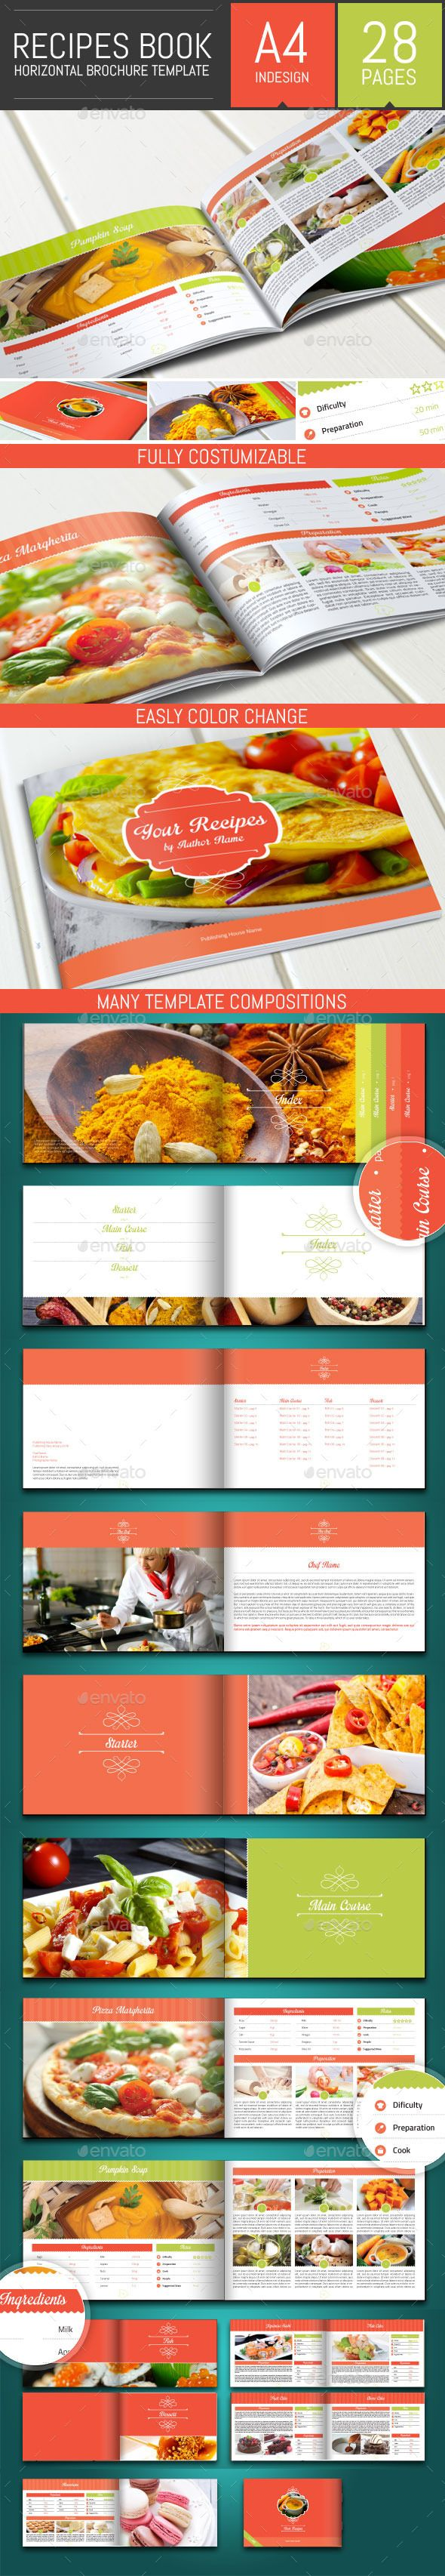 Recipes Book Horizontal Brochure Template Brochure Template - Horizontal brochure template